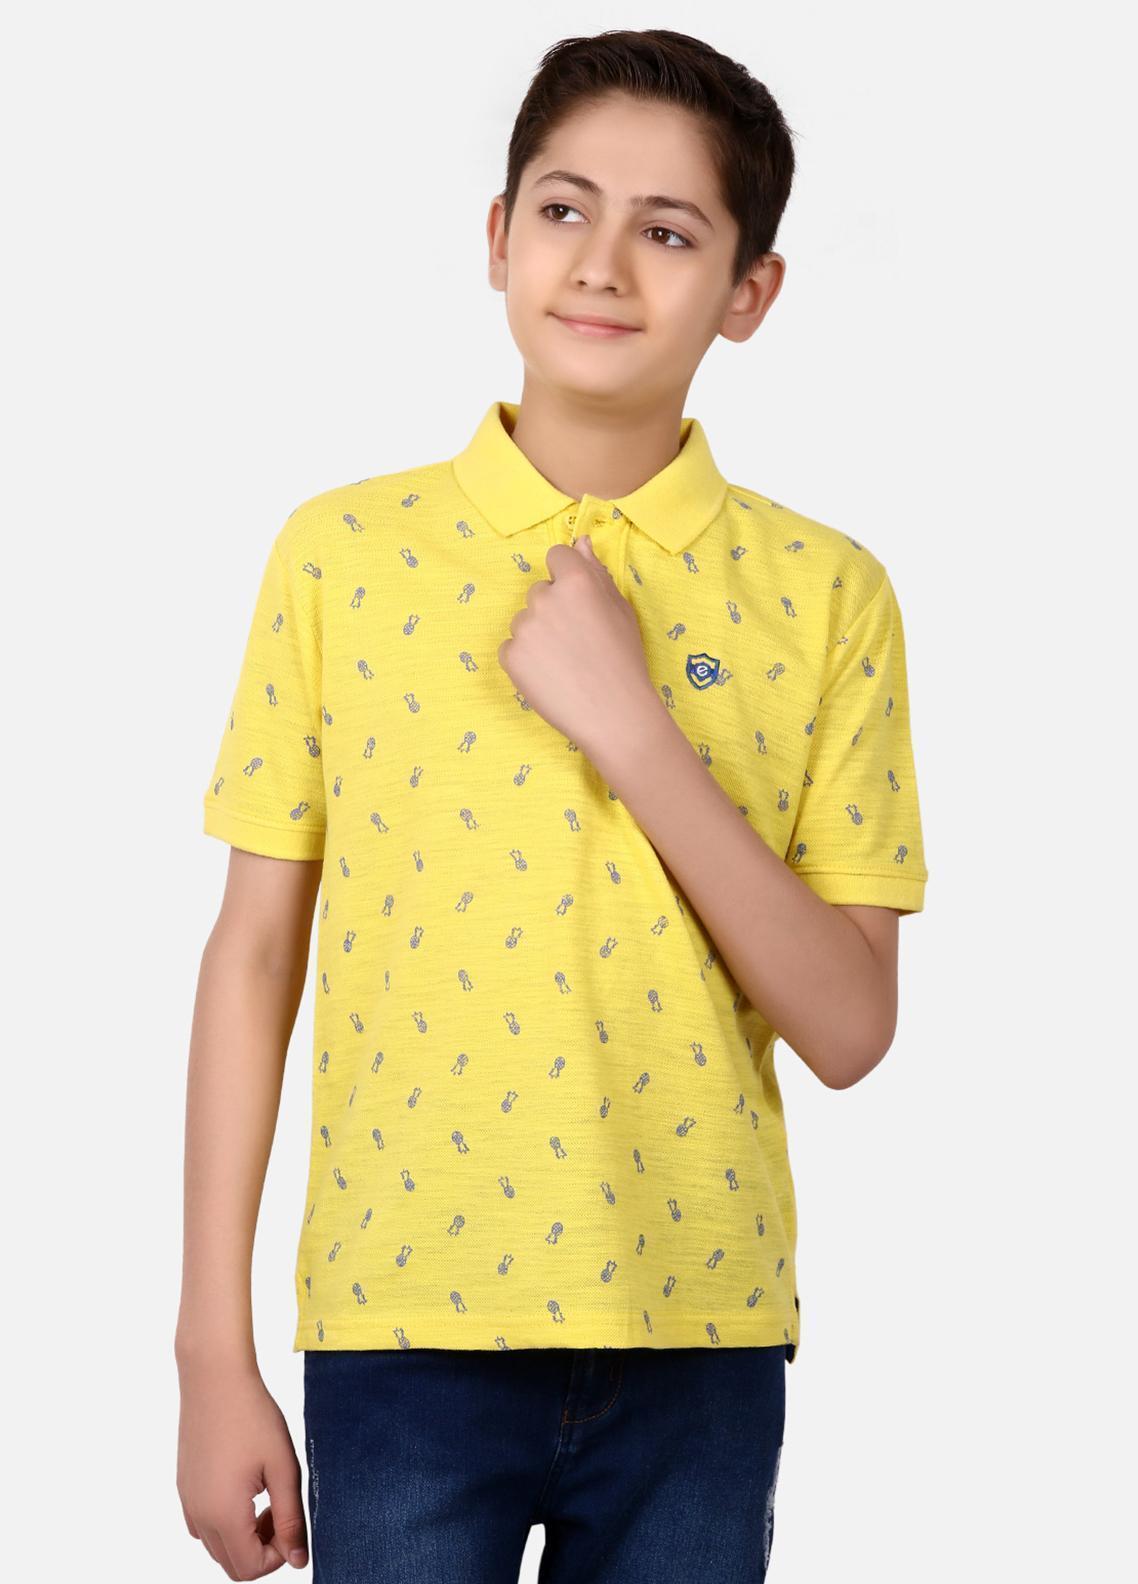 Edenrobe Cotton Polo Boys Shirts - Yellow EBTPS19-017